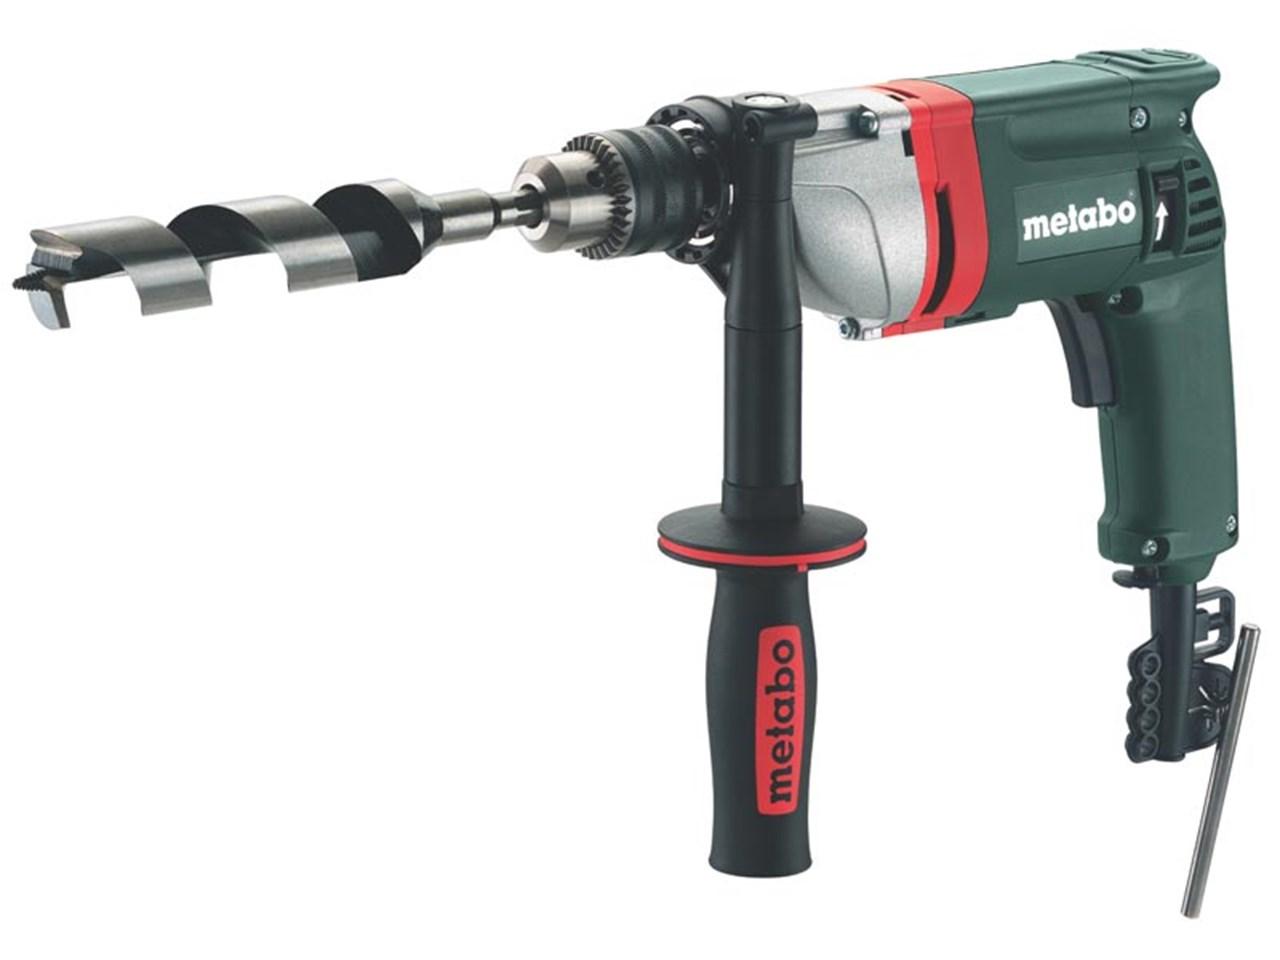 Metabo BE75-16 110v 75Nm High Torque Rotary Drill MetaLoc